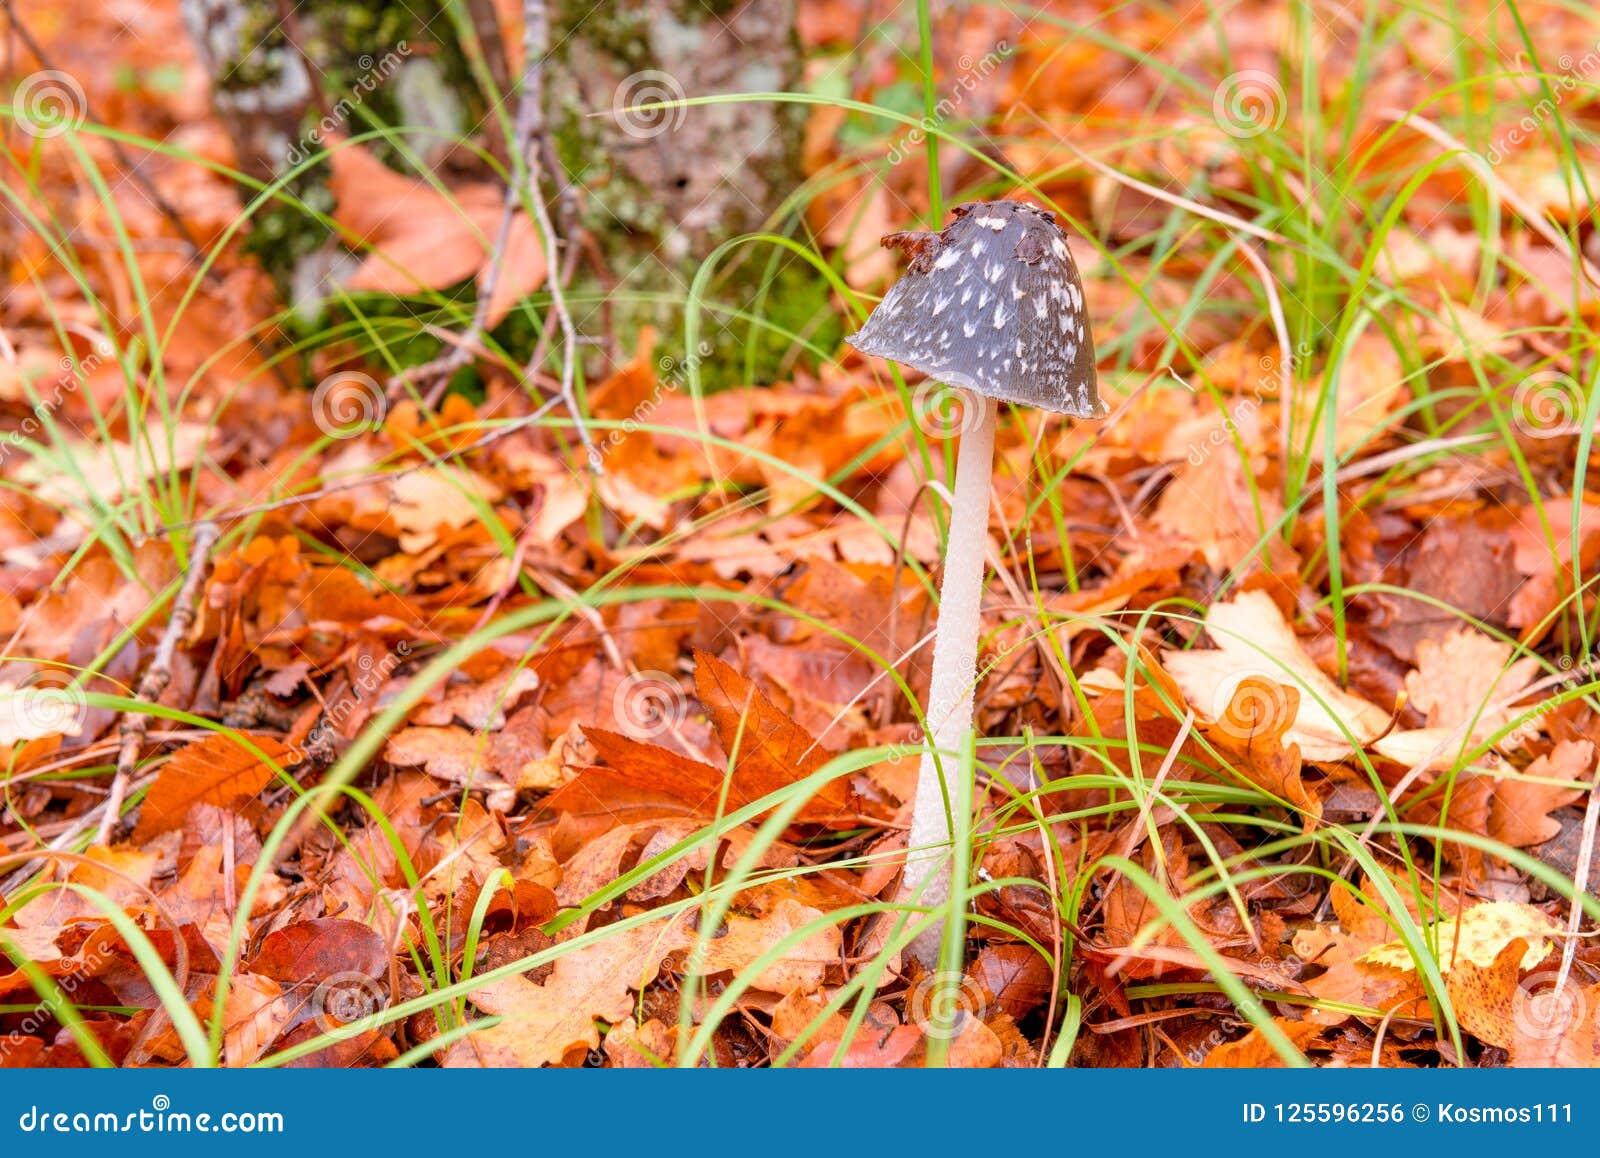 Futenclose-up in het bos onder